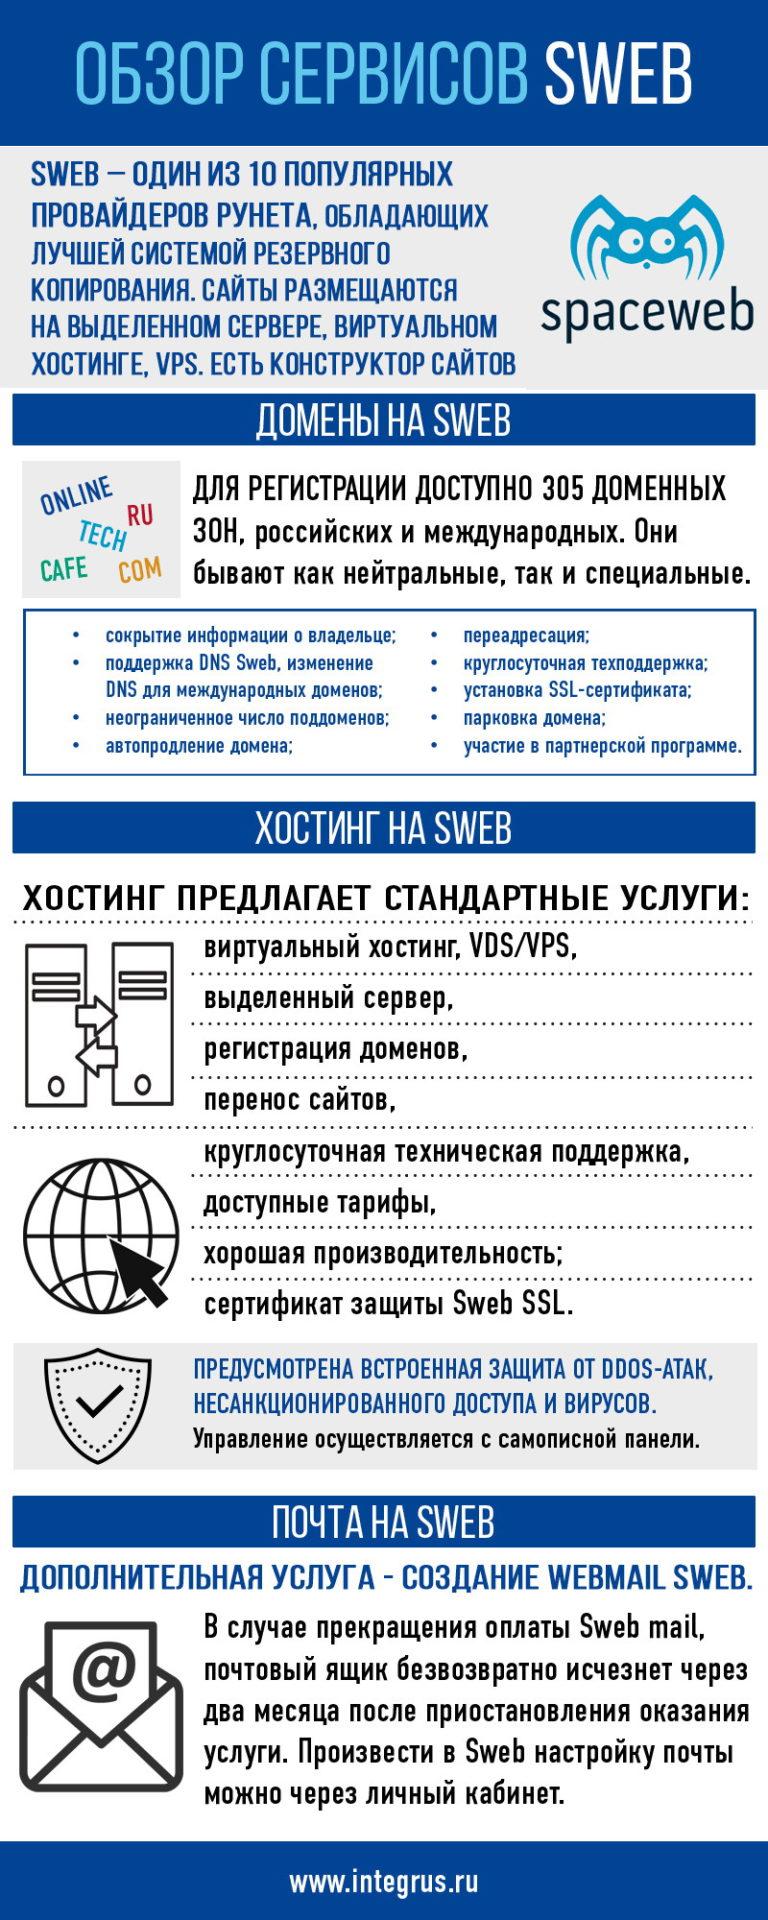 Обзор сервисов Sweb